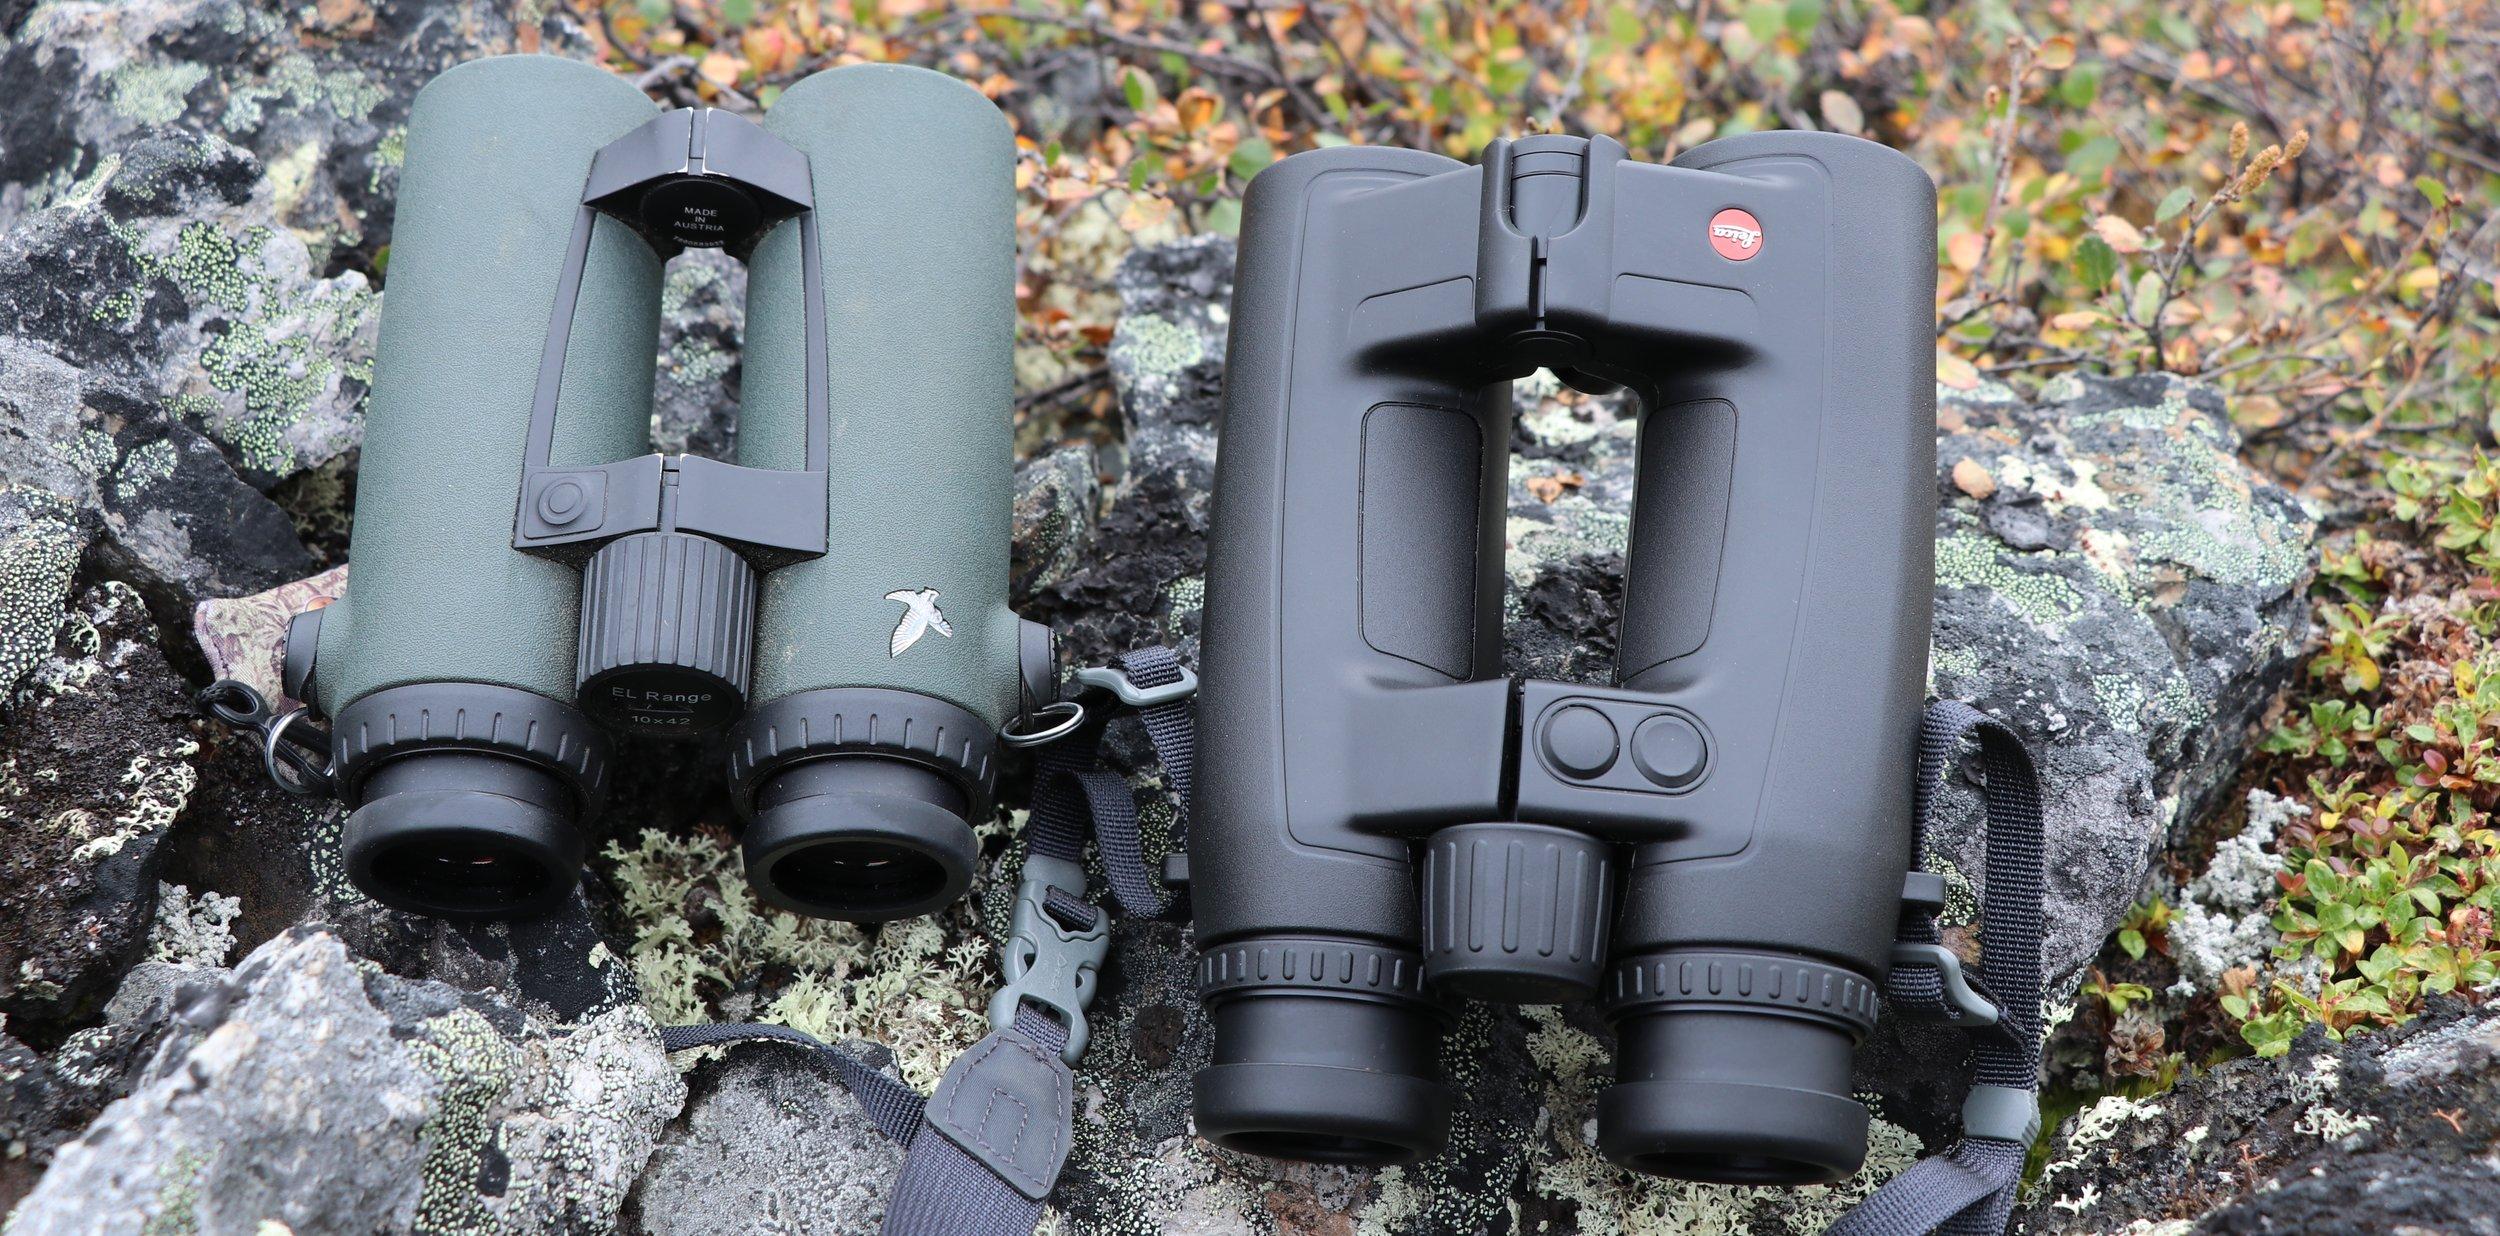 The Swarovski EL Range (left) is noticeably smaller than the Leica HD-B.